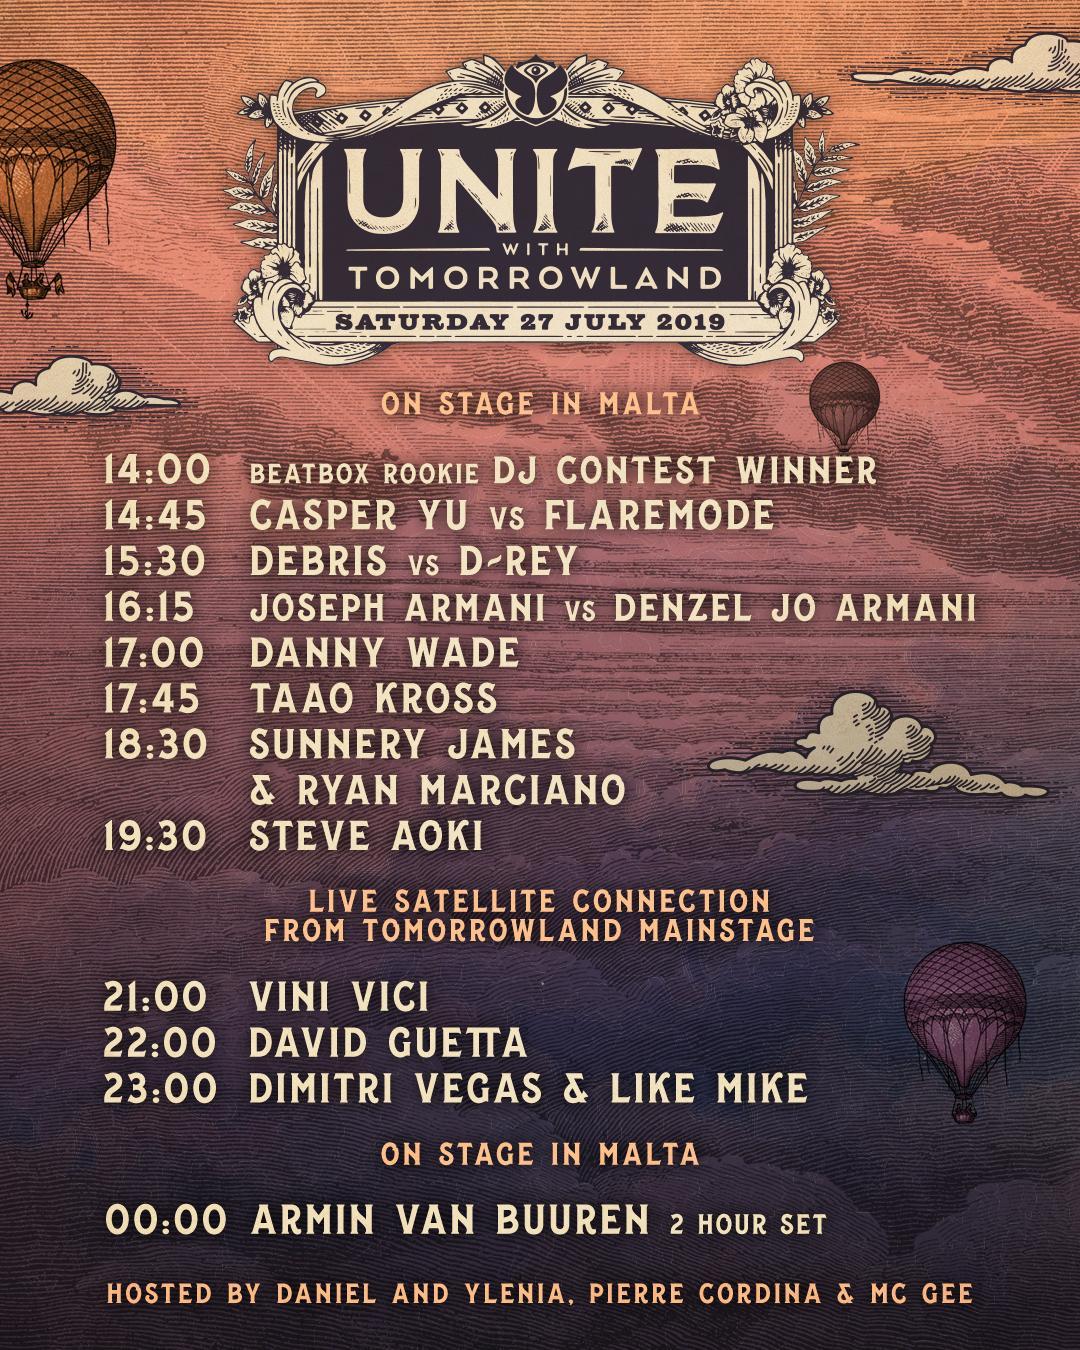 UNITE with Tomorrowland setlist